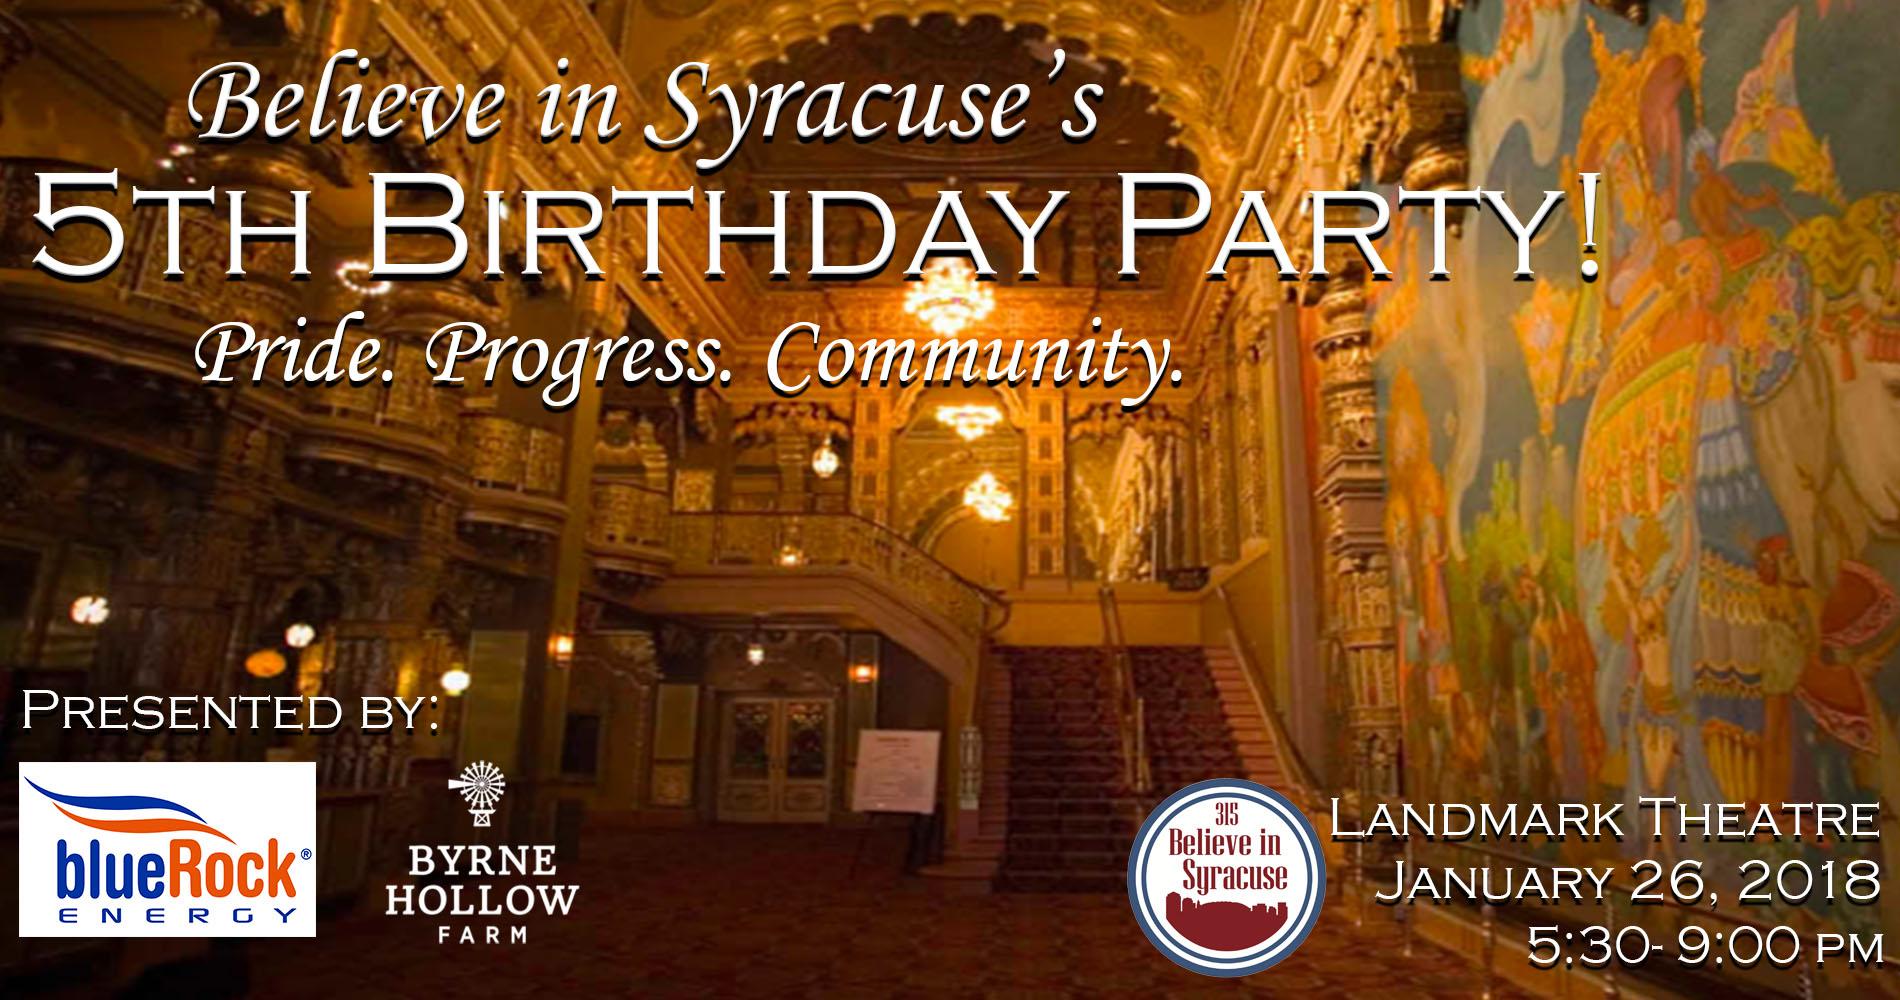 5th_birthday_party_1.9_x1.jpg